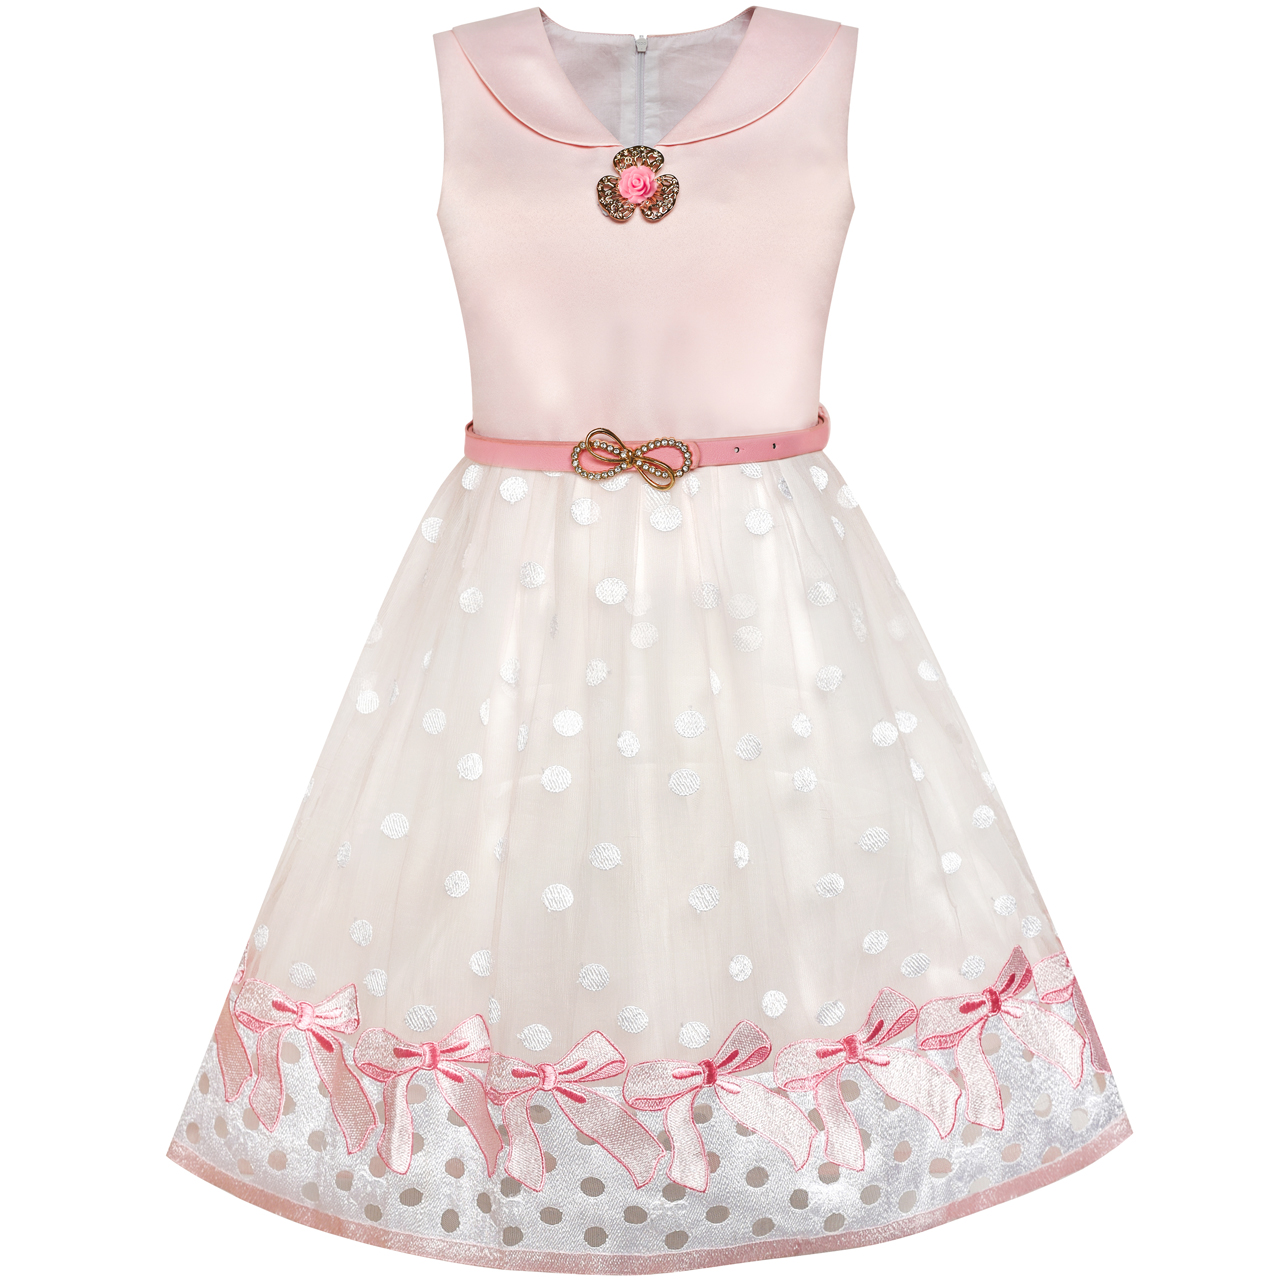 Flower     Girl     Dress   Sailor Collar Pink Belted Bow Tie Elegant   Dress   2018 Summer Princess Wedding Party   Dresses   Clothes Size 7-14